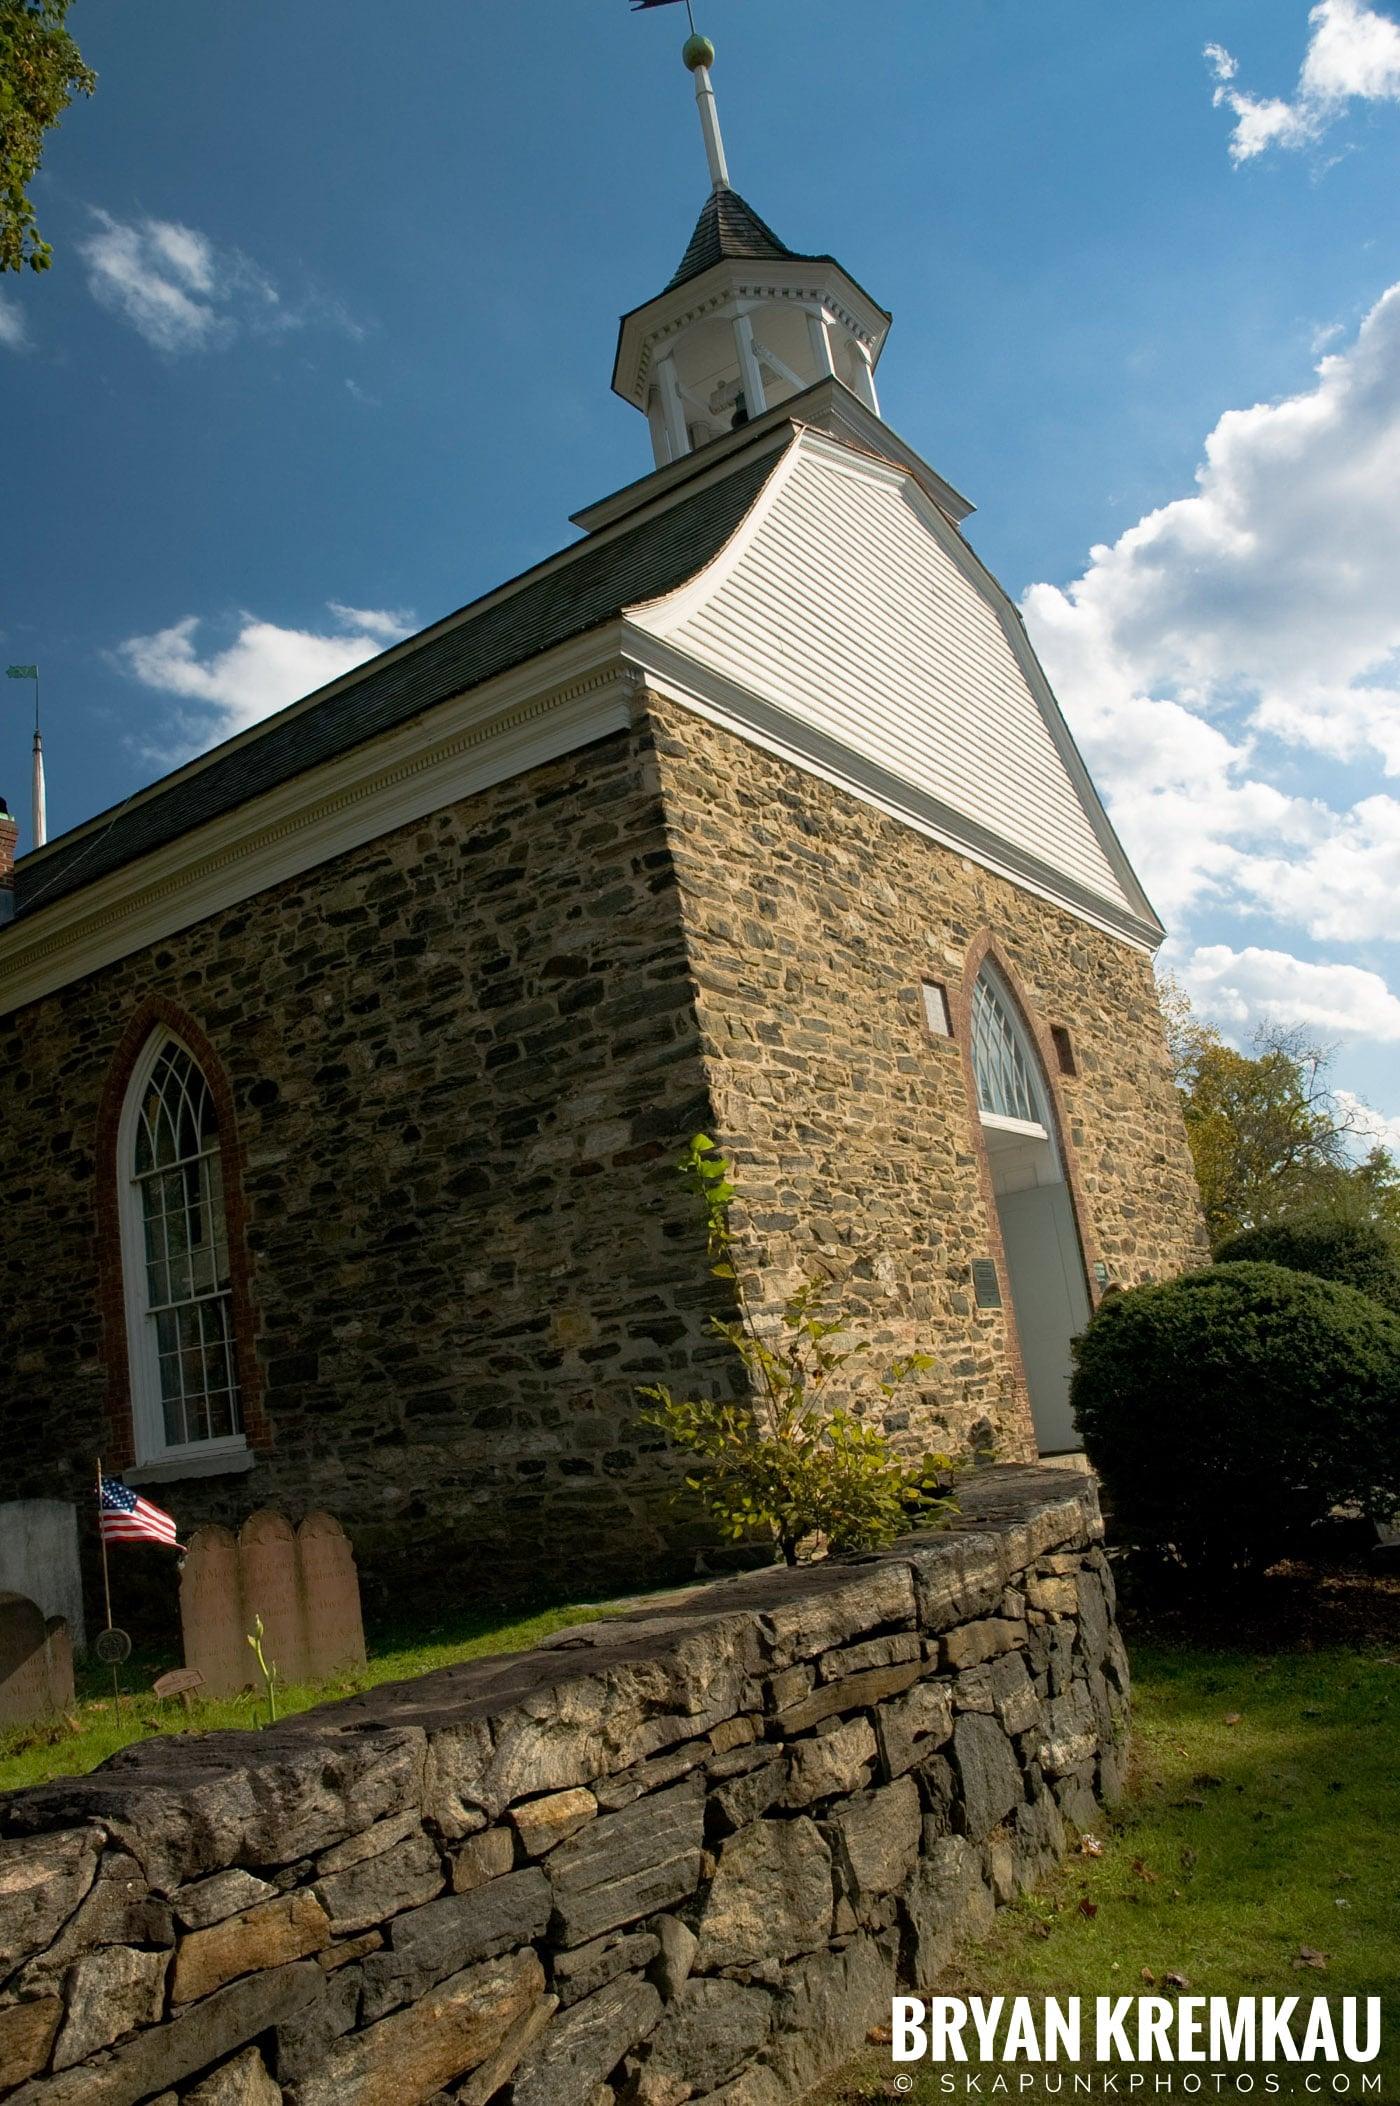 The Old Dutch Church & Lyndhurst Mansion @ Sleepy Hollow/Tarrytown, NY - 10.20.07 (35)